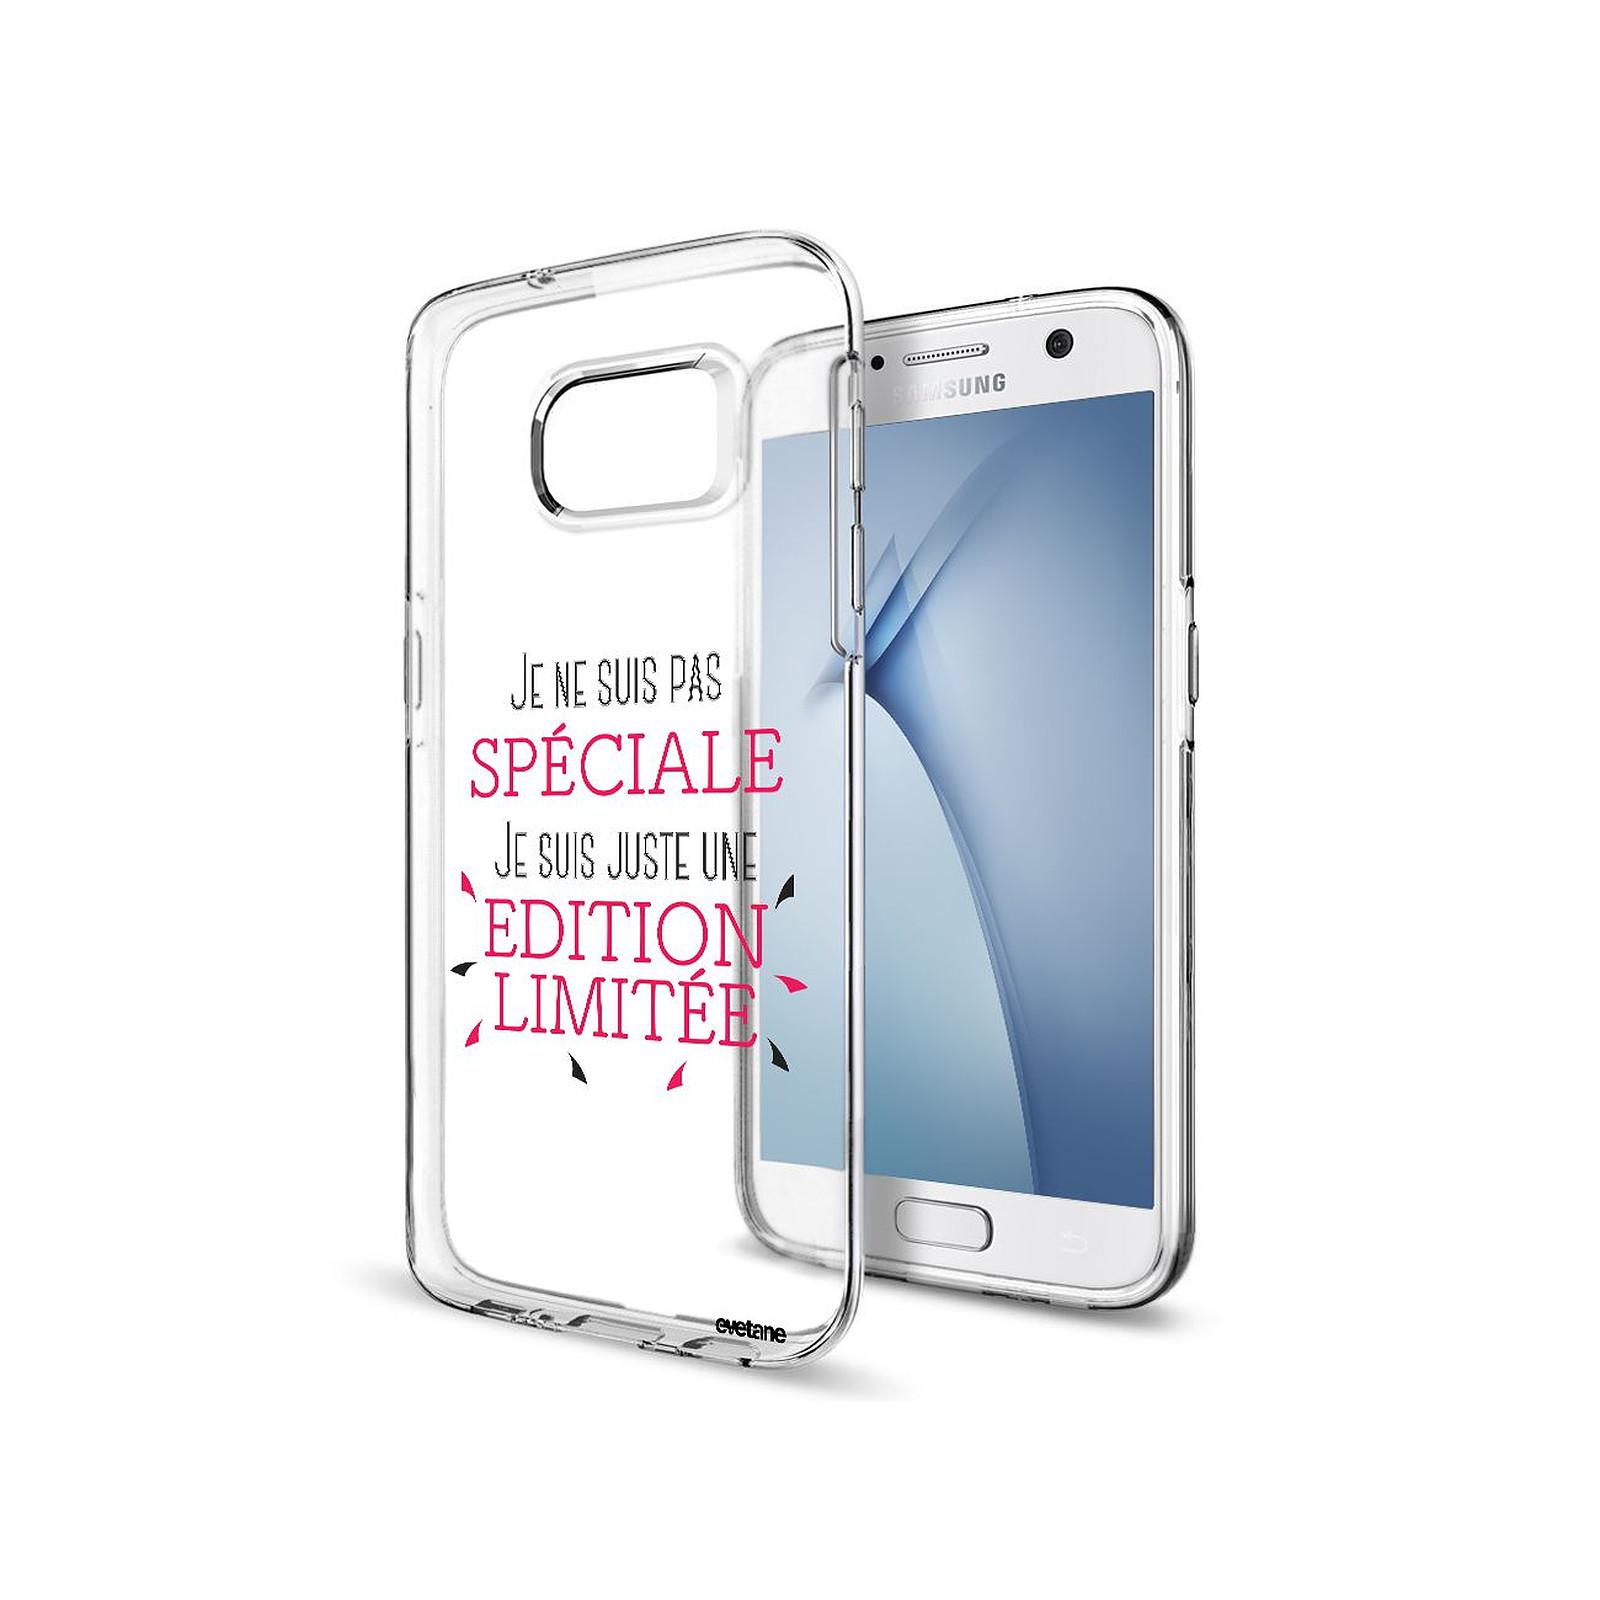 EVETANE Coque Samsung Galaxy S7 Edge souple transparente Spéciale édition limitée